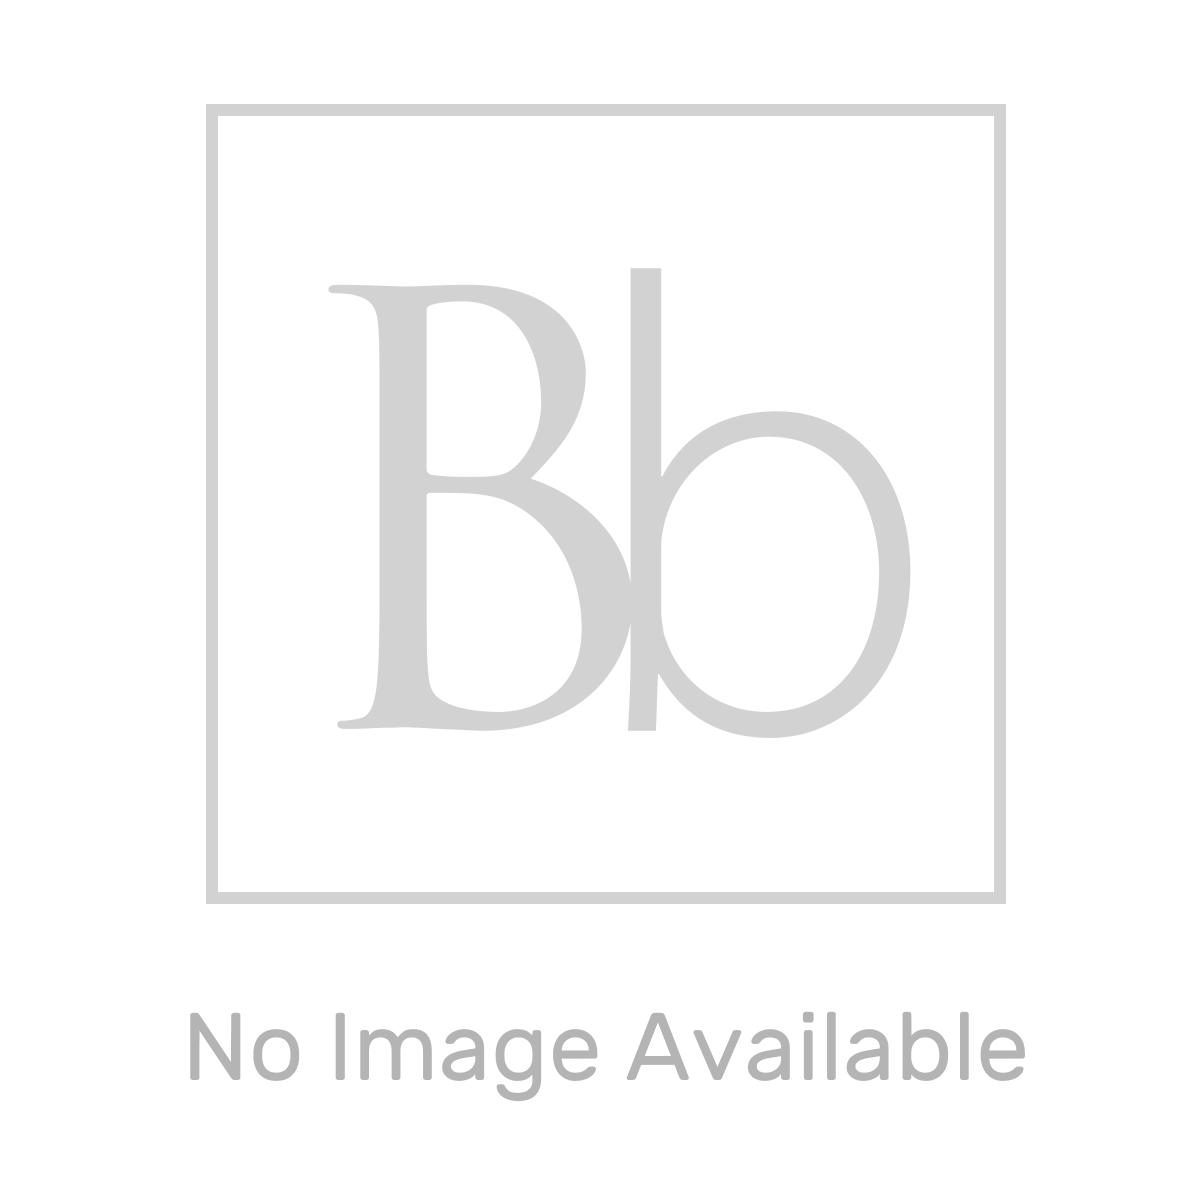 HiB Tulsa White Single Door Bathroom Mirrored Cabinet